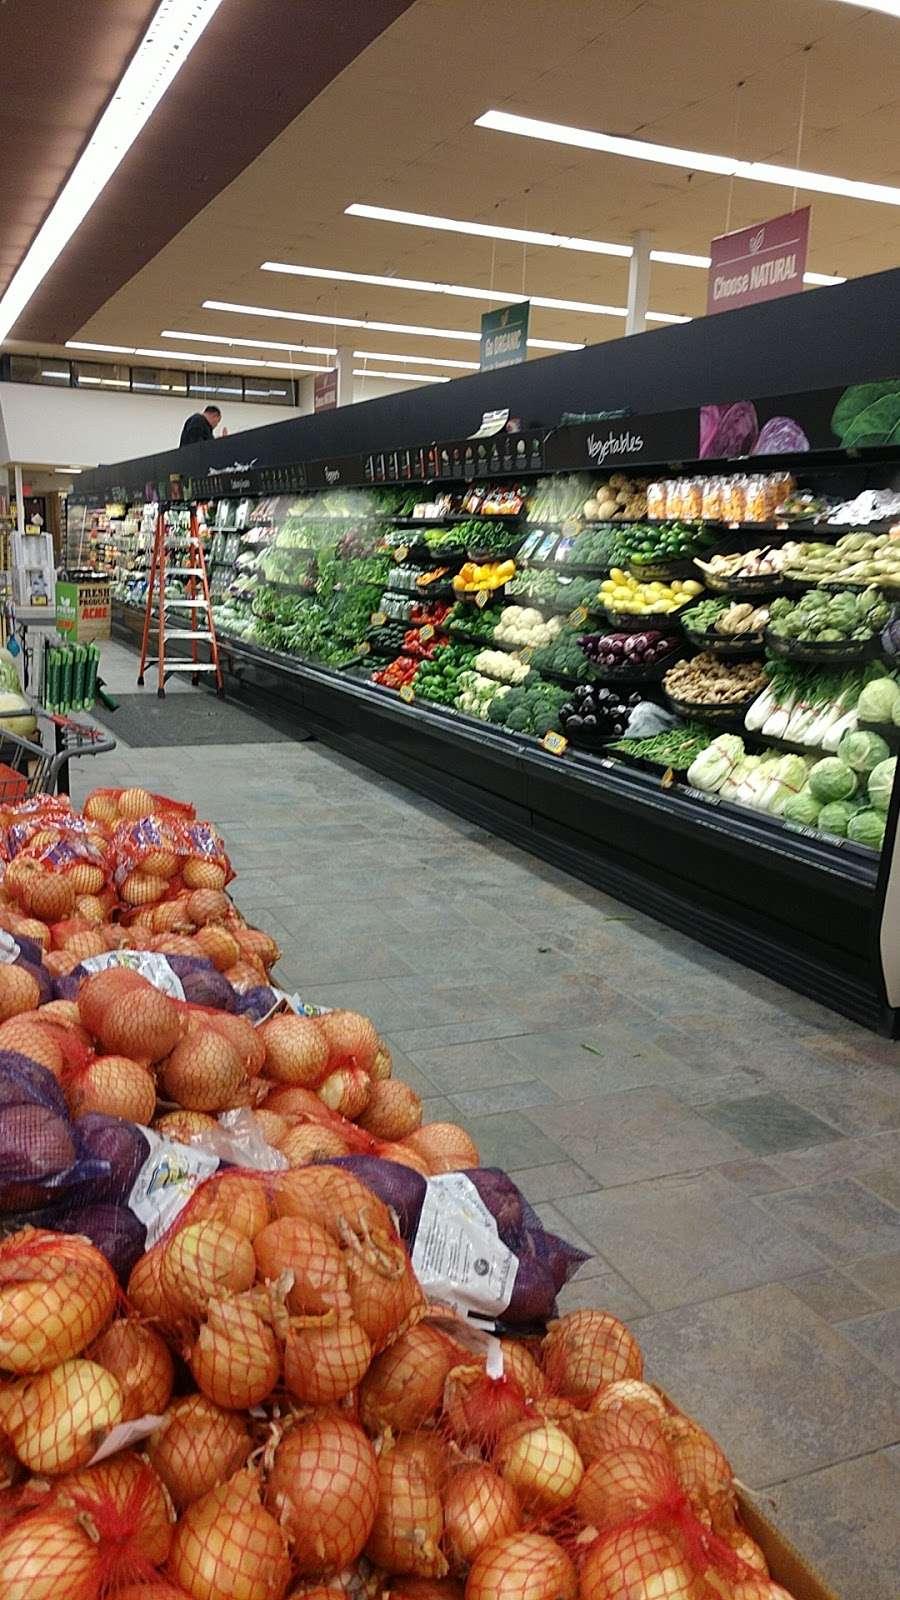 ACME Markets - store  | Photo 1 of 10 | Address: 321 NJ-440, Jersey City, NJ 07305, USA | Phone: (201) 946-2525